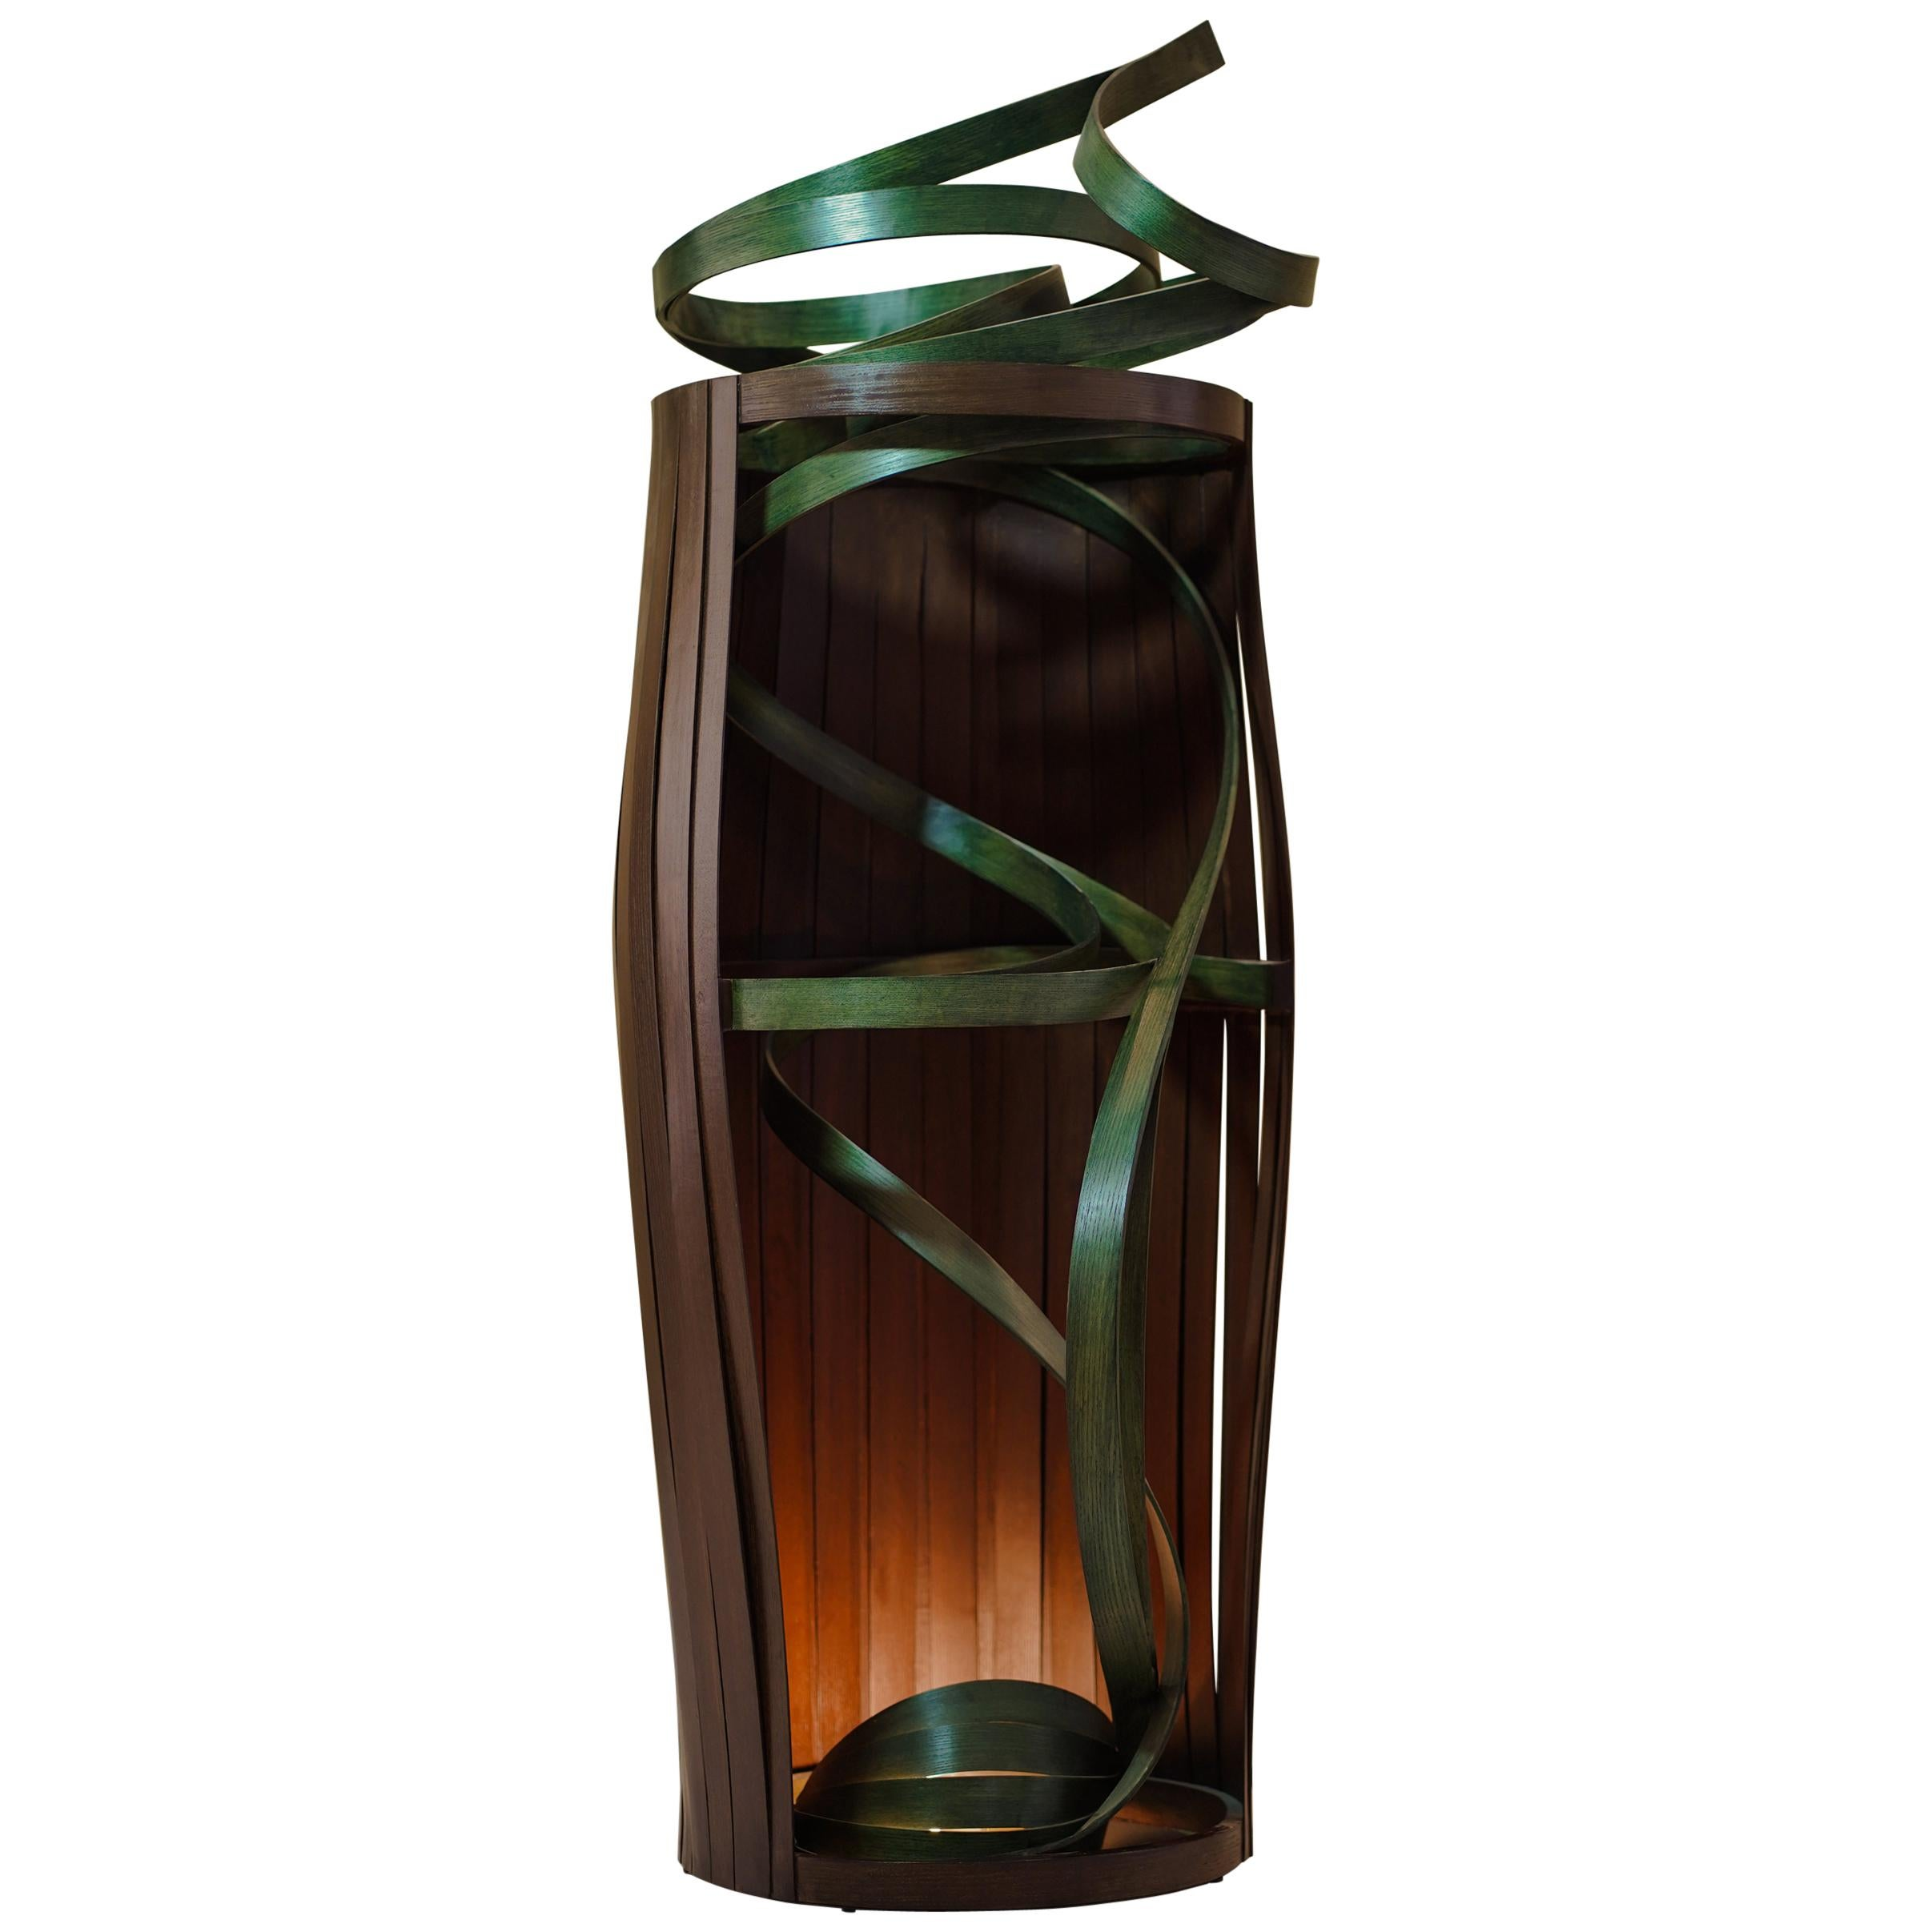 Barrel Shaped Sculptural Solid Bent Wood Floor Lamp, Handcrafted by Raka Studio